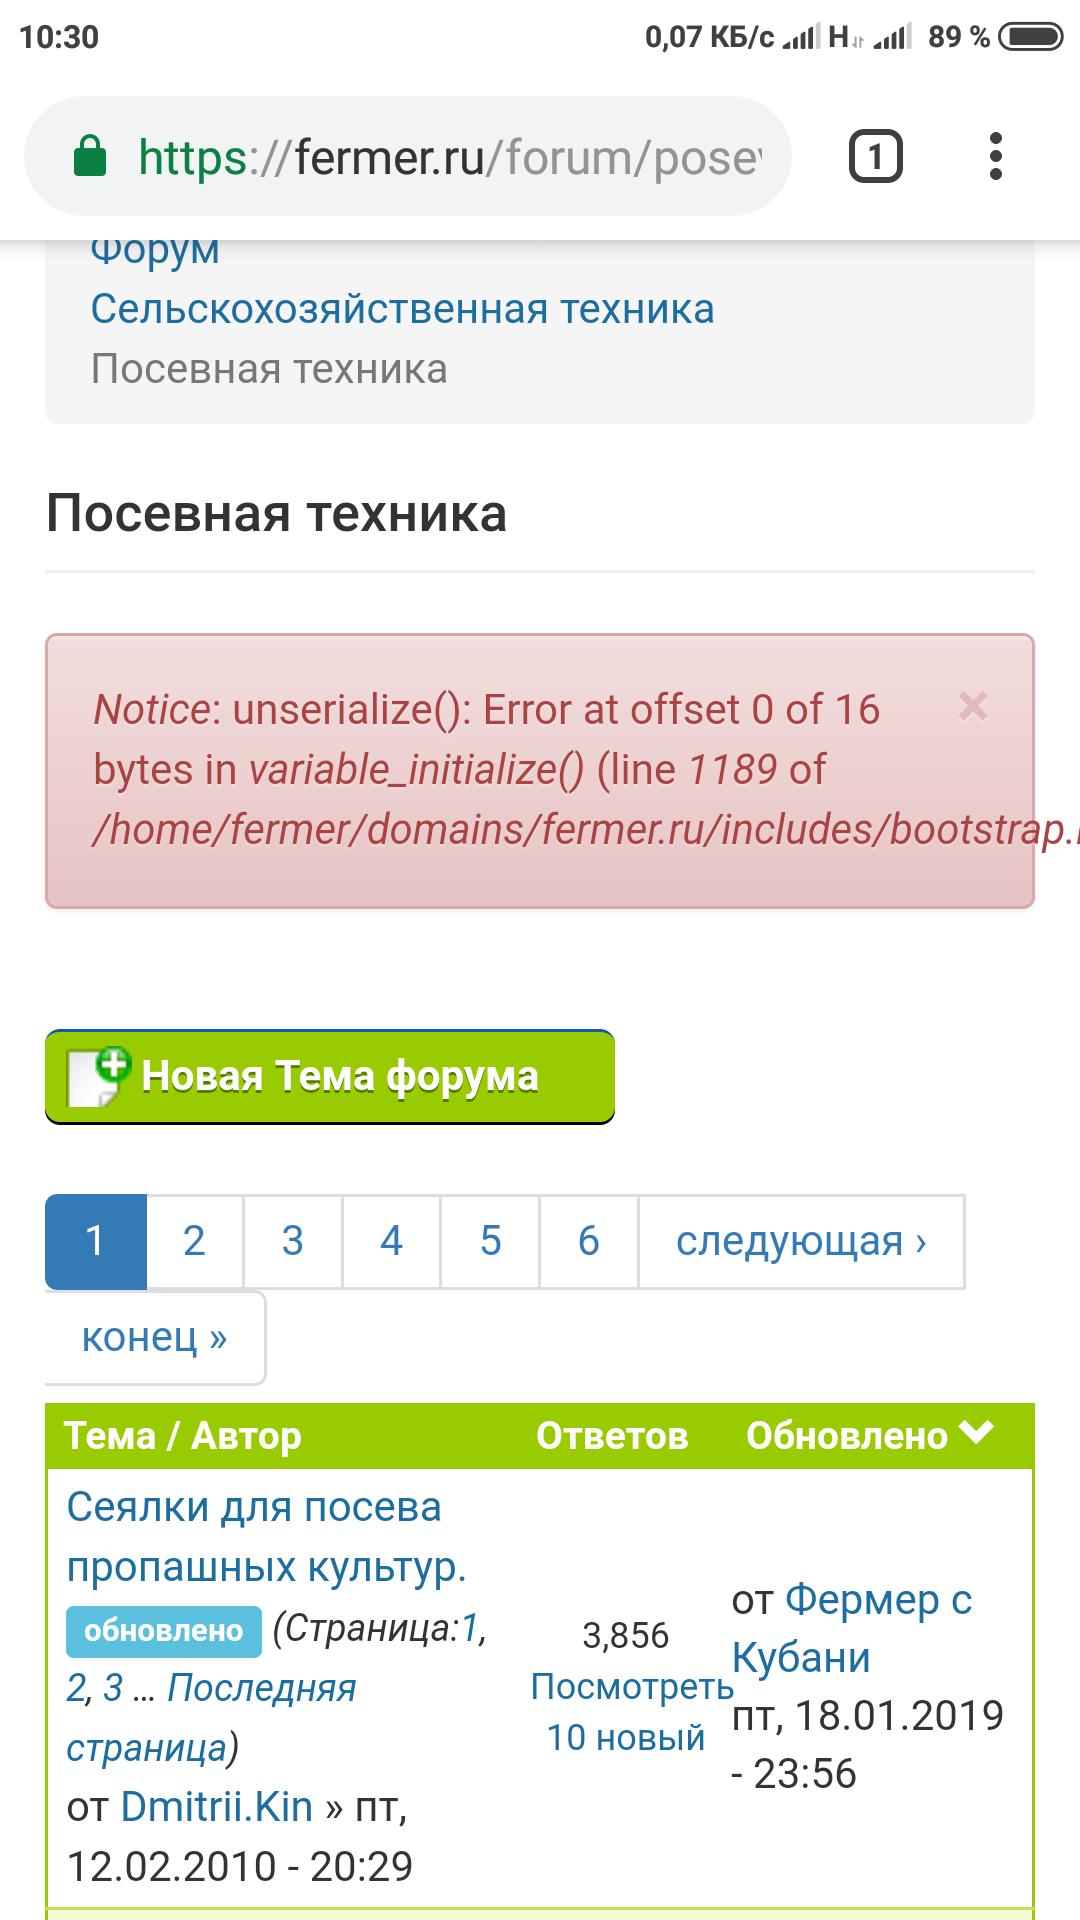 screenshot2019-01-19-10-30-57-069comandroidchrome.png